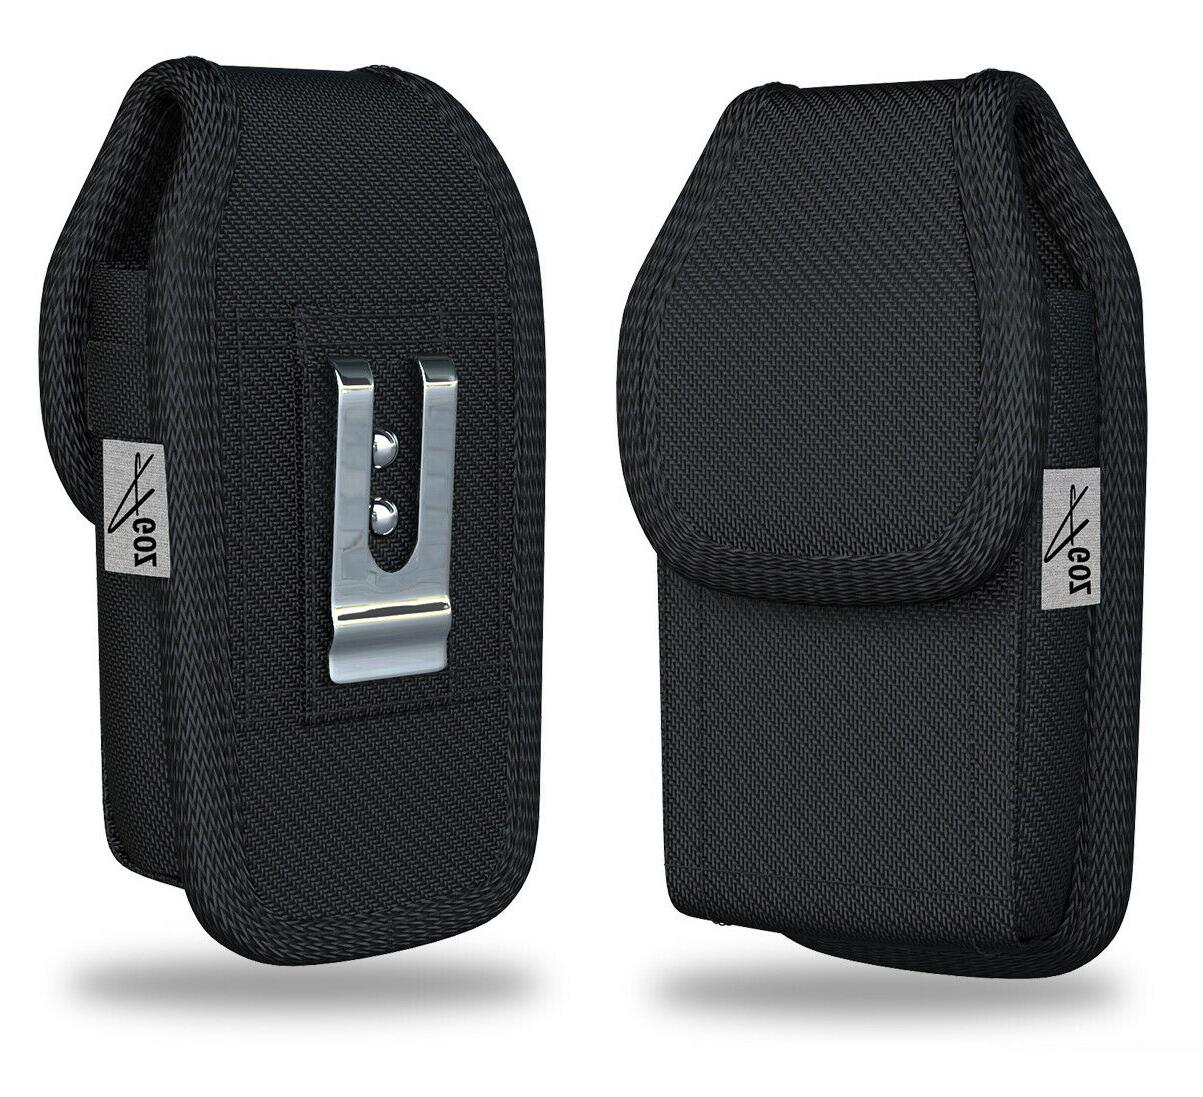 rugged canvas vertical belt clip case pouch